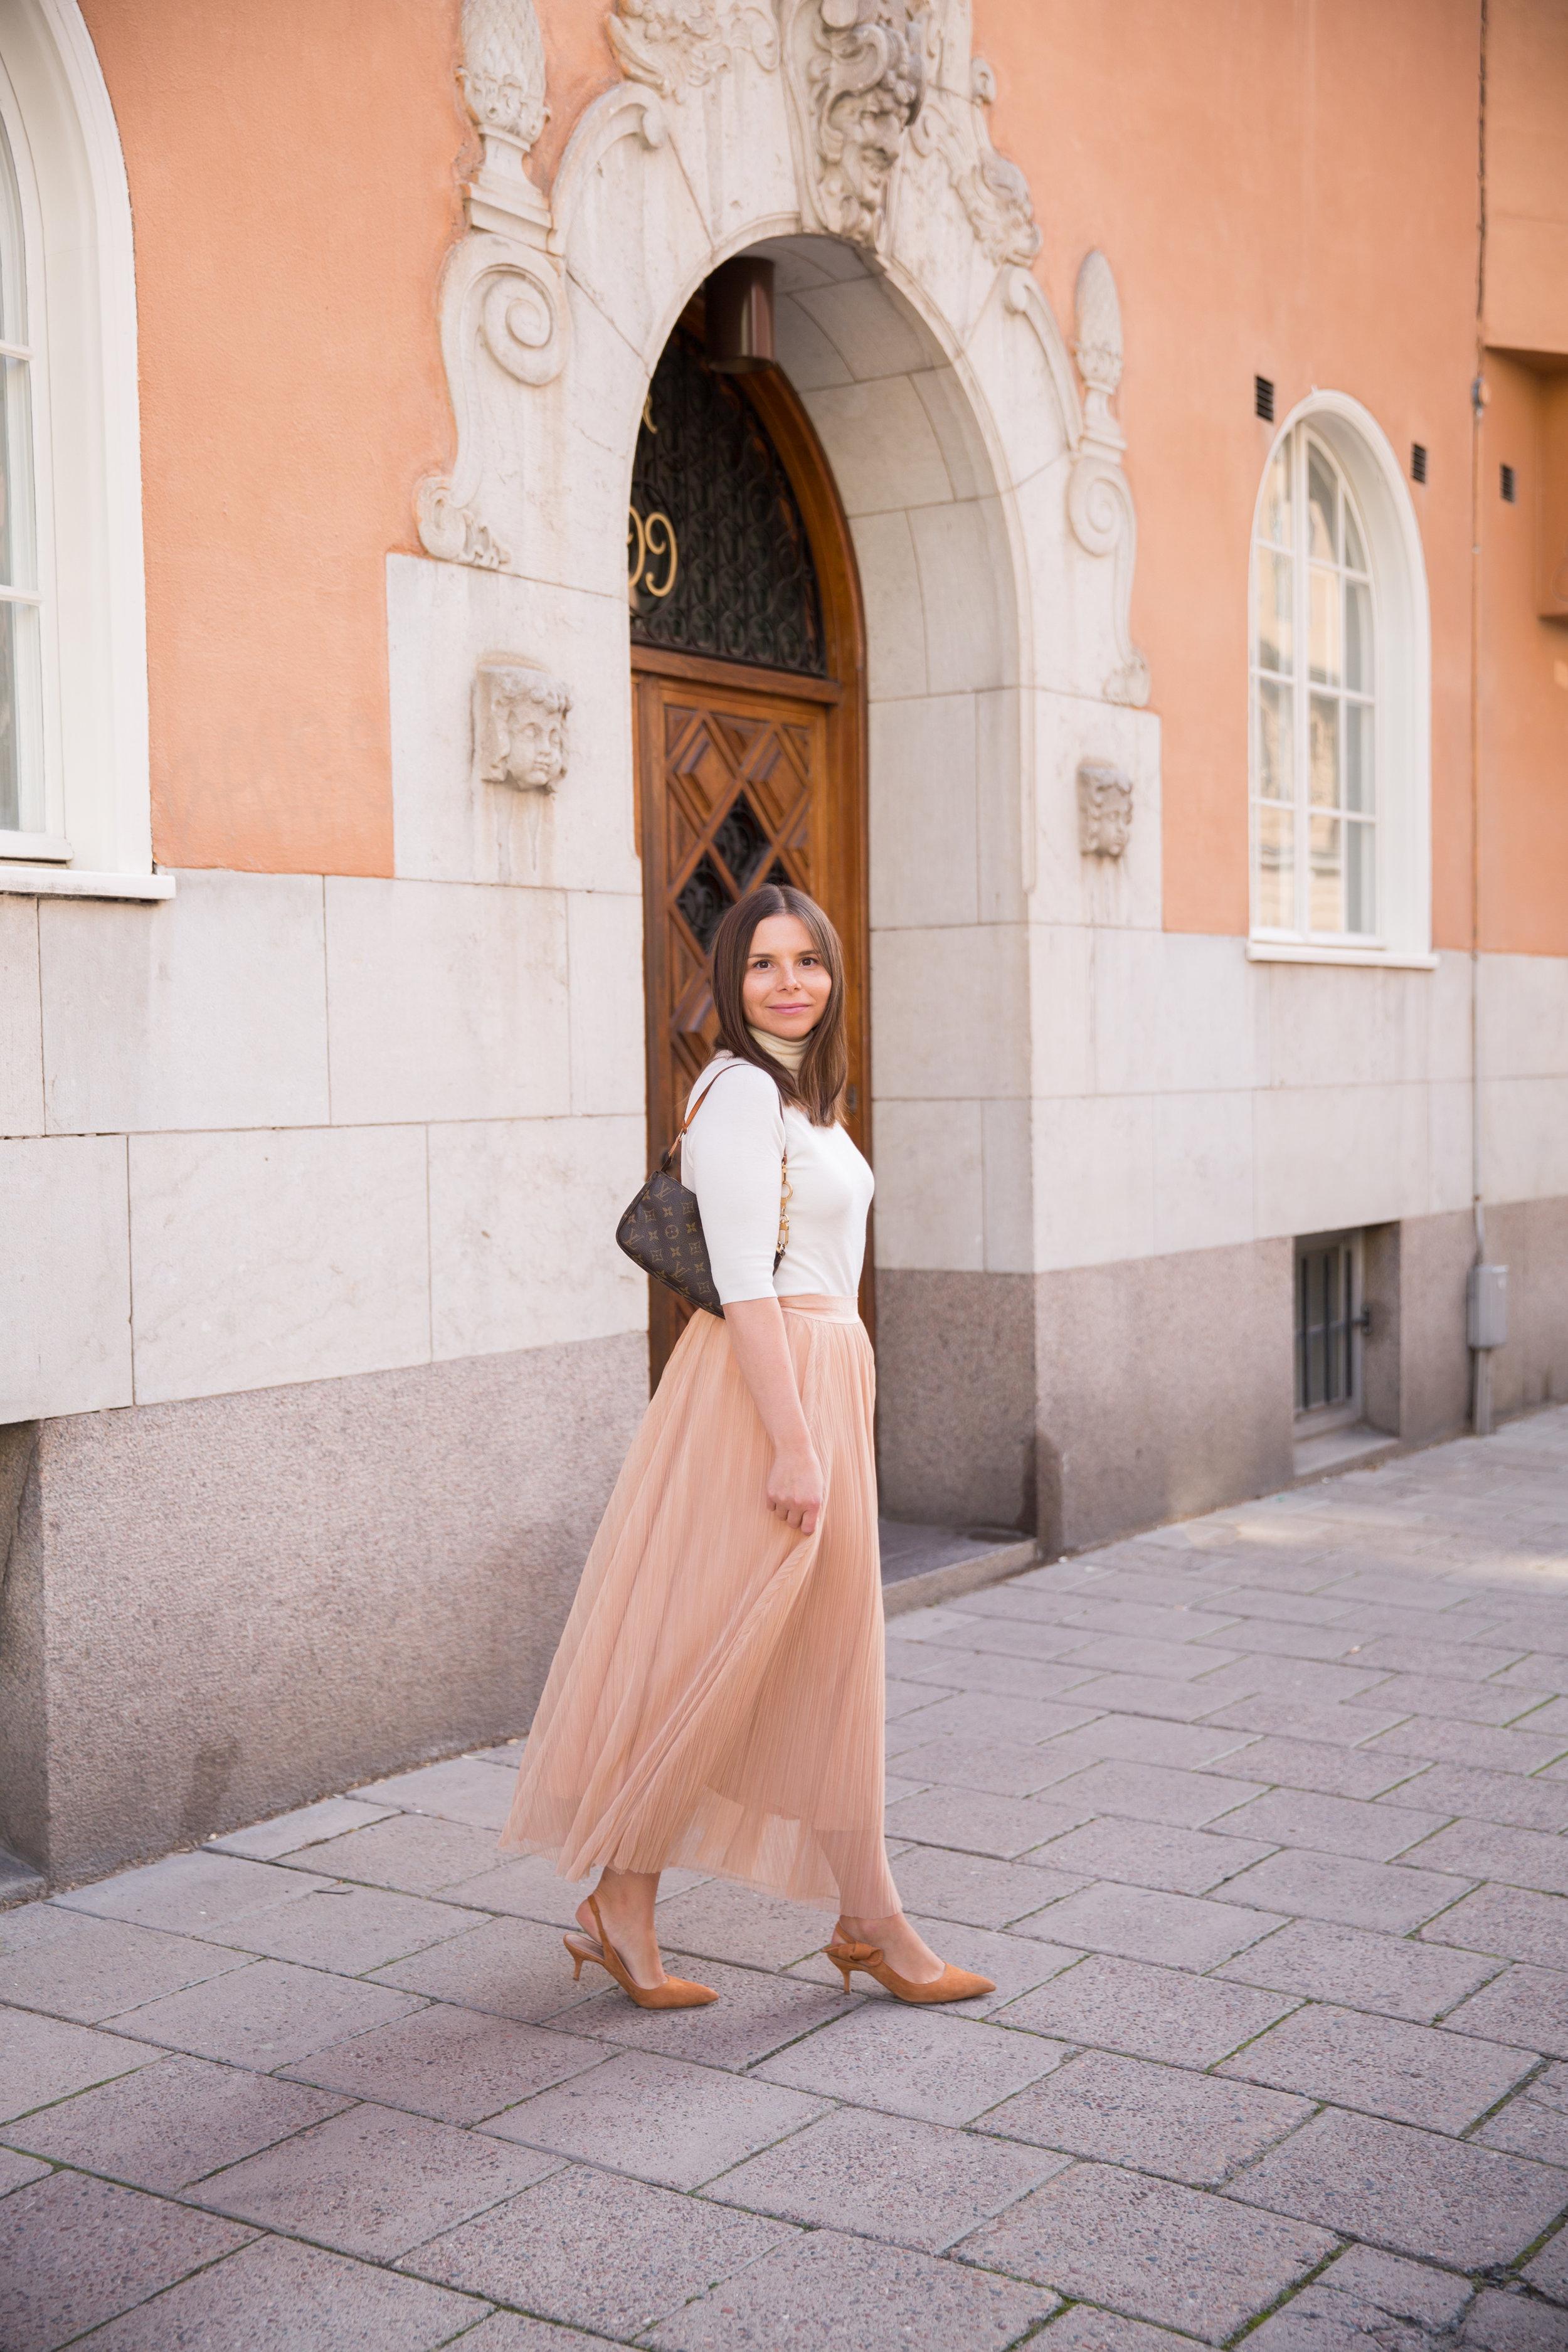 Angelica Aurell plisserad kjol tyllkjol polotroja polotroja.jpg